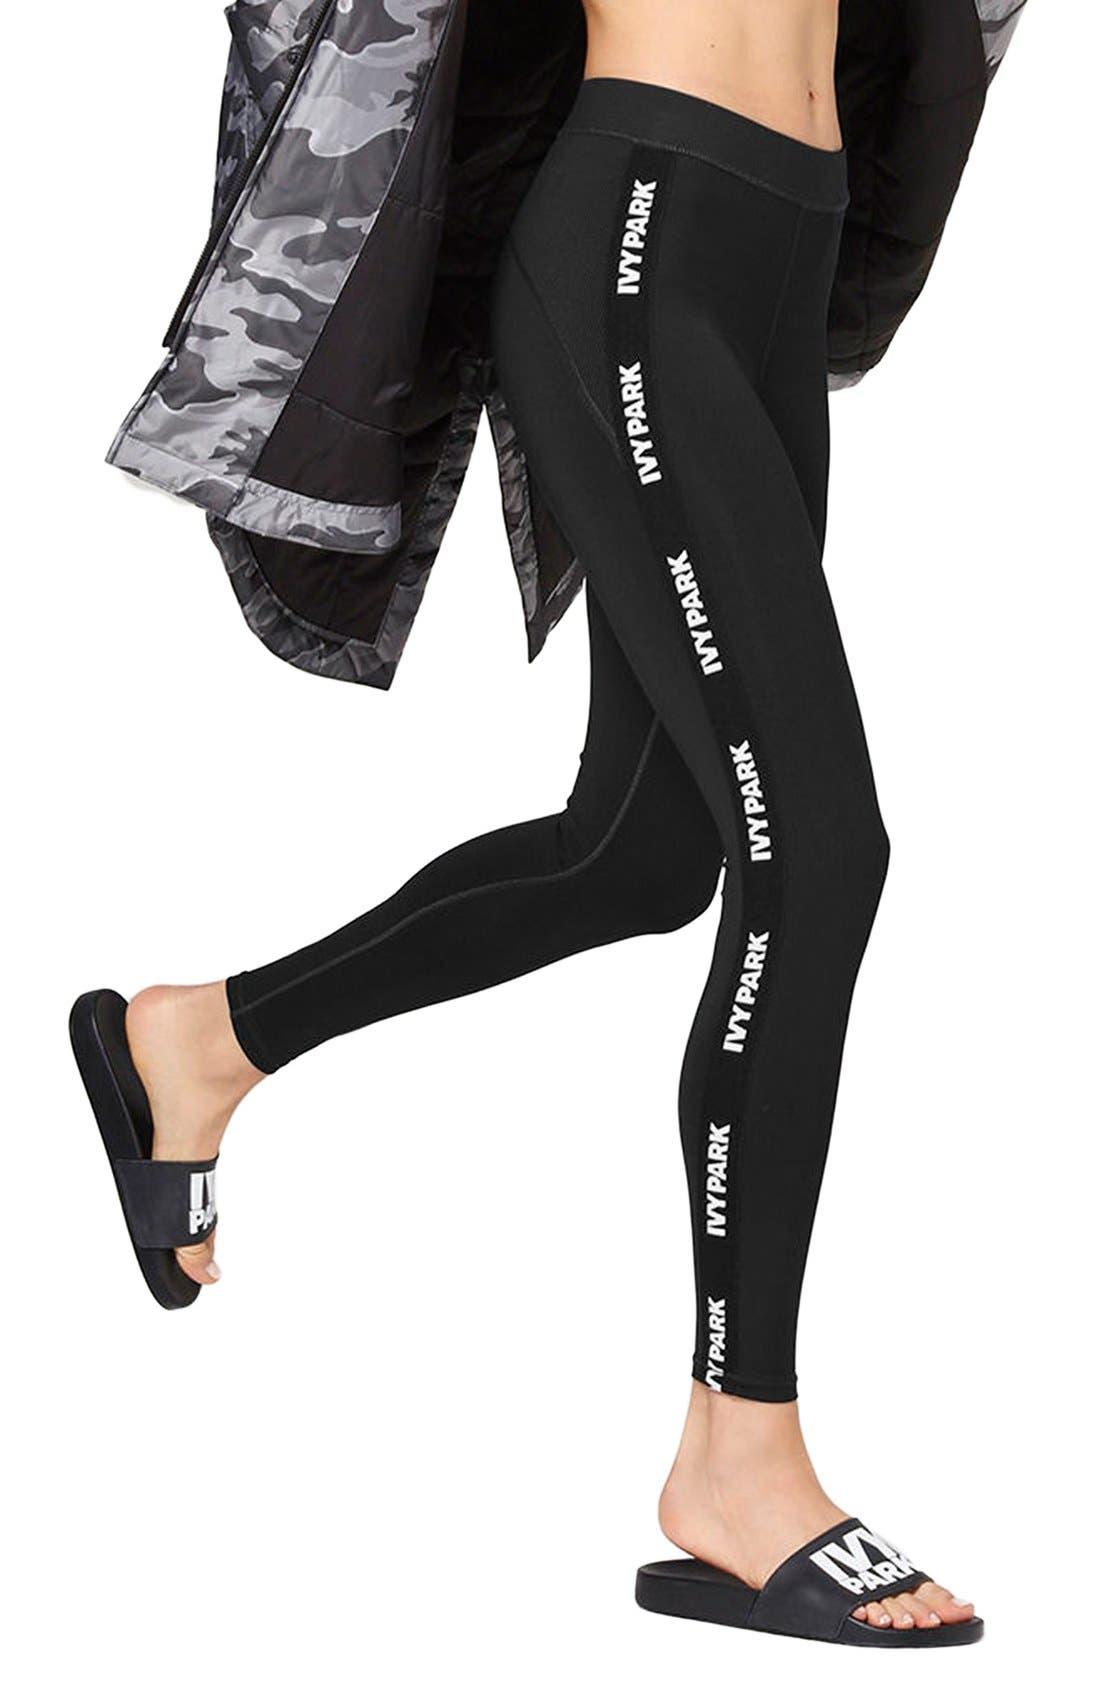 Main Image - IVY PARK® Elastic Logo Mid Rise Leggings